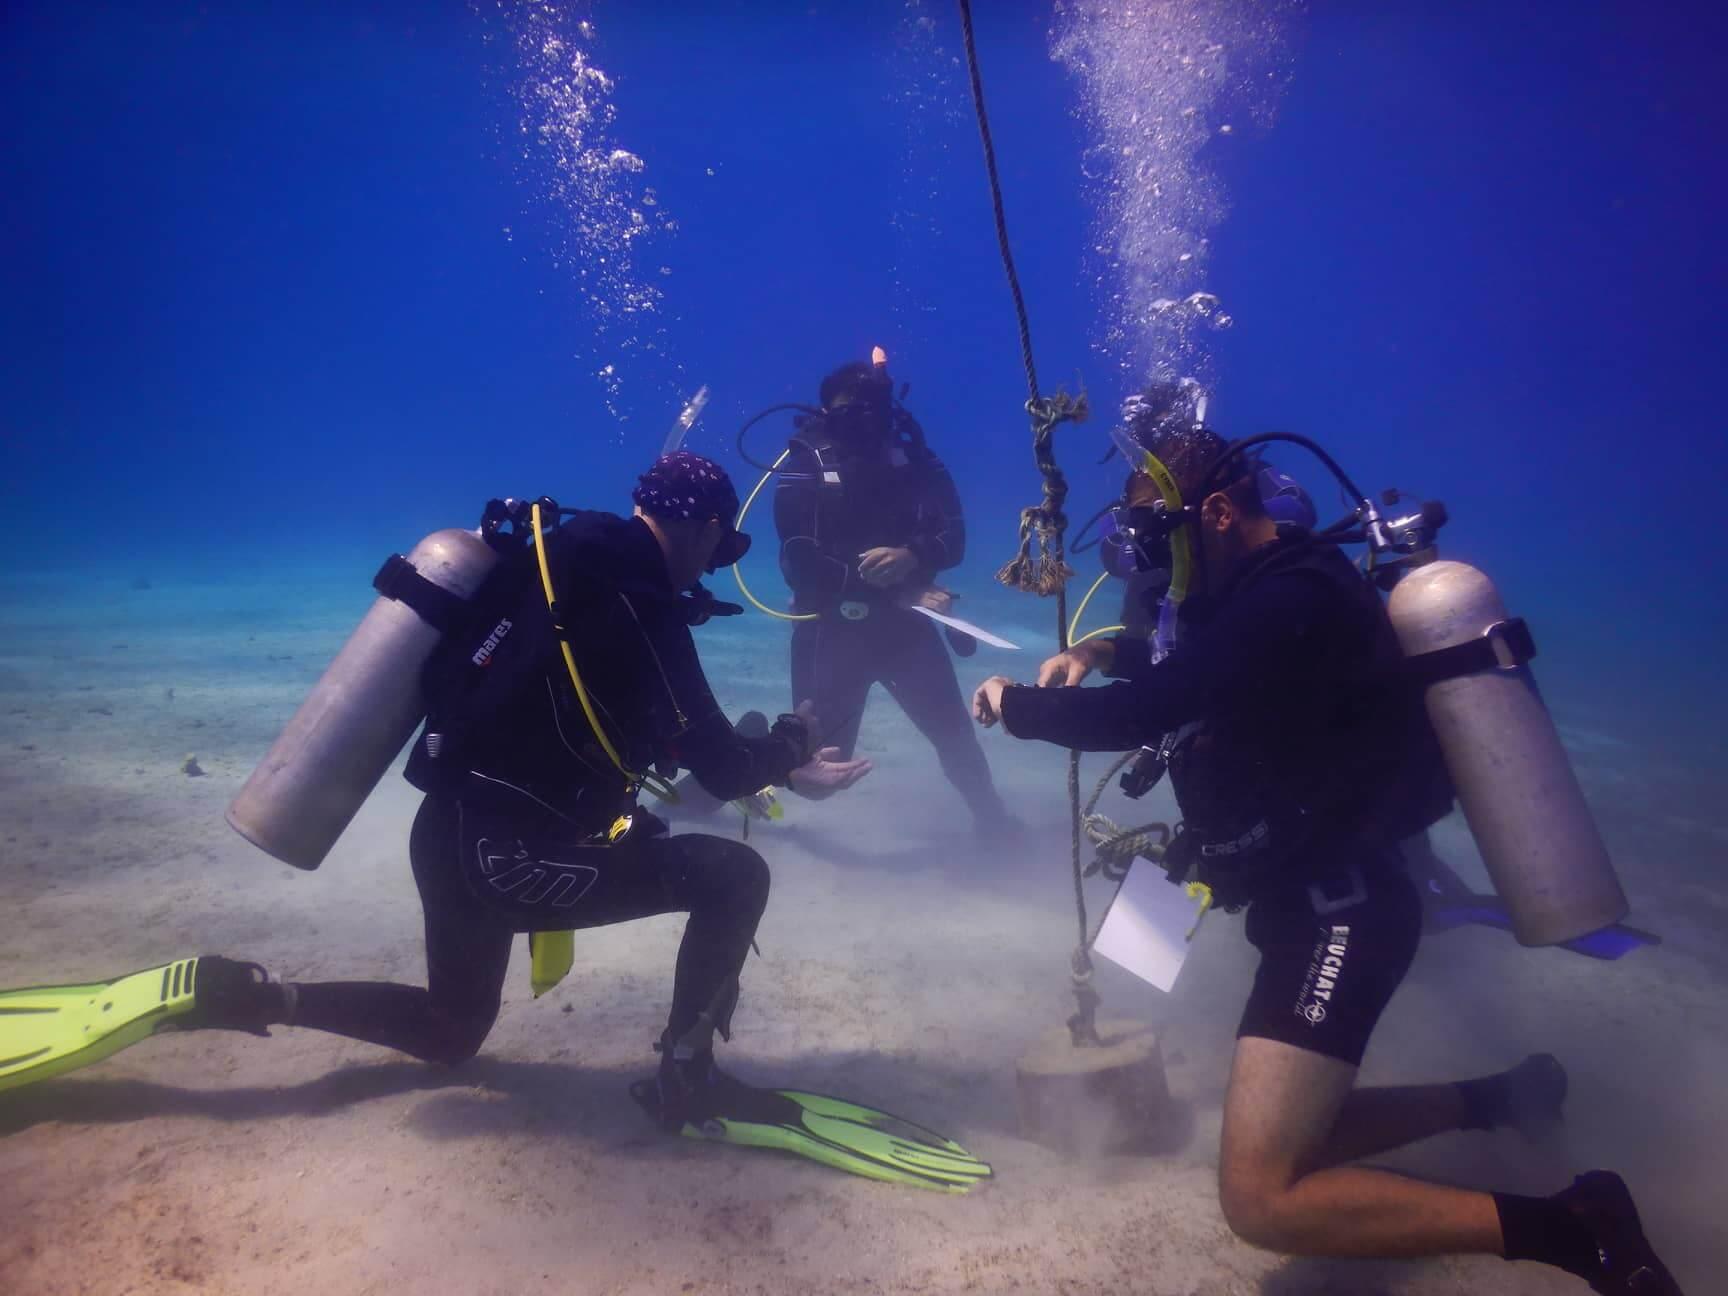 Egypt-REDSEA-Hurghada-DivePro-Academy-Scuba-Diving-Center-Divers-3